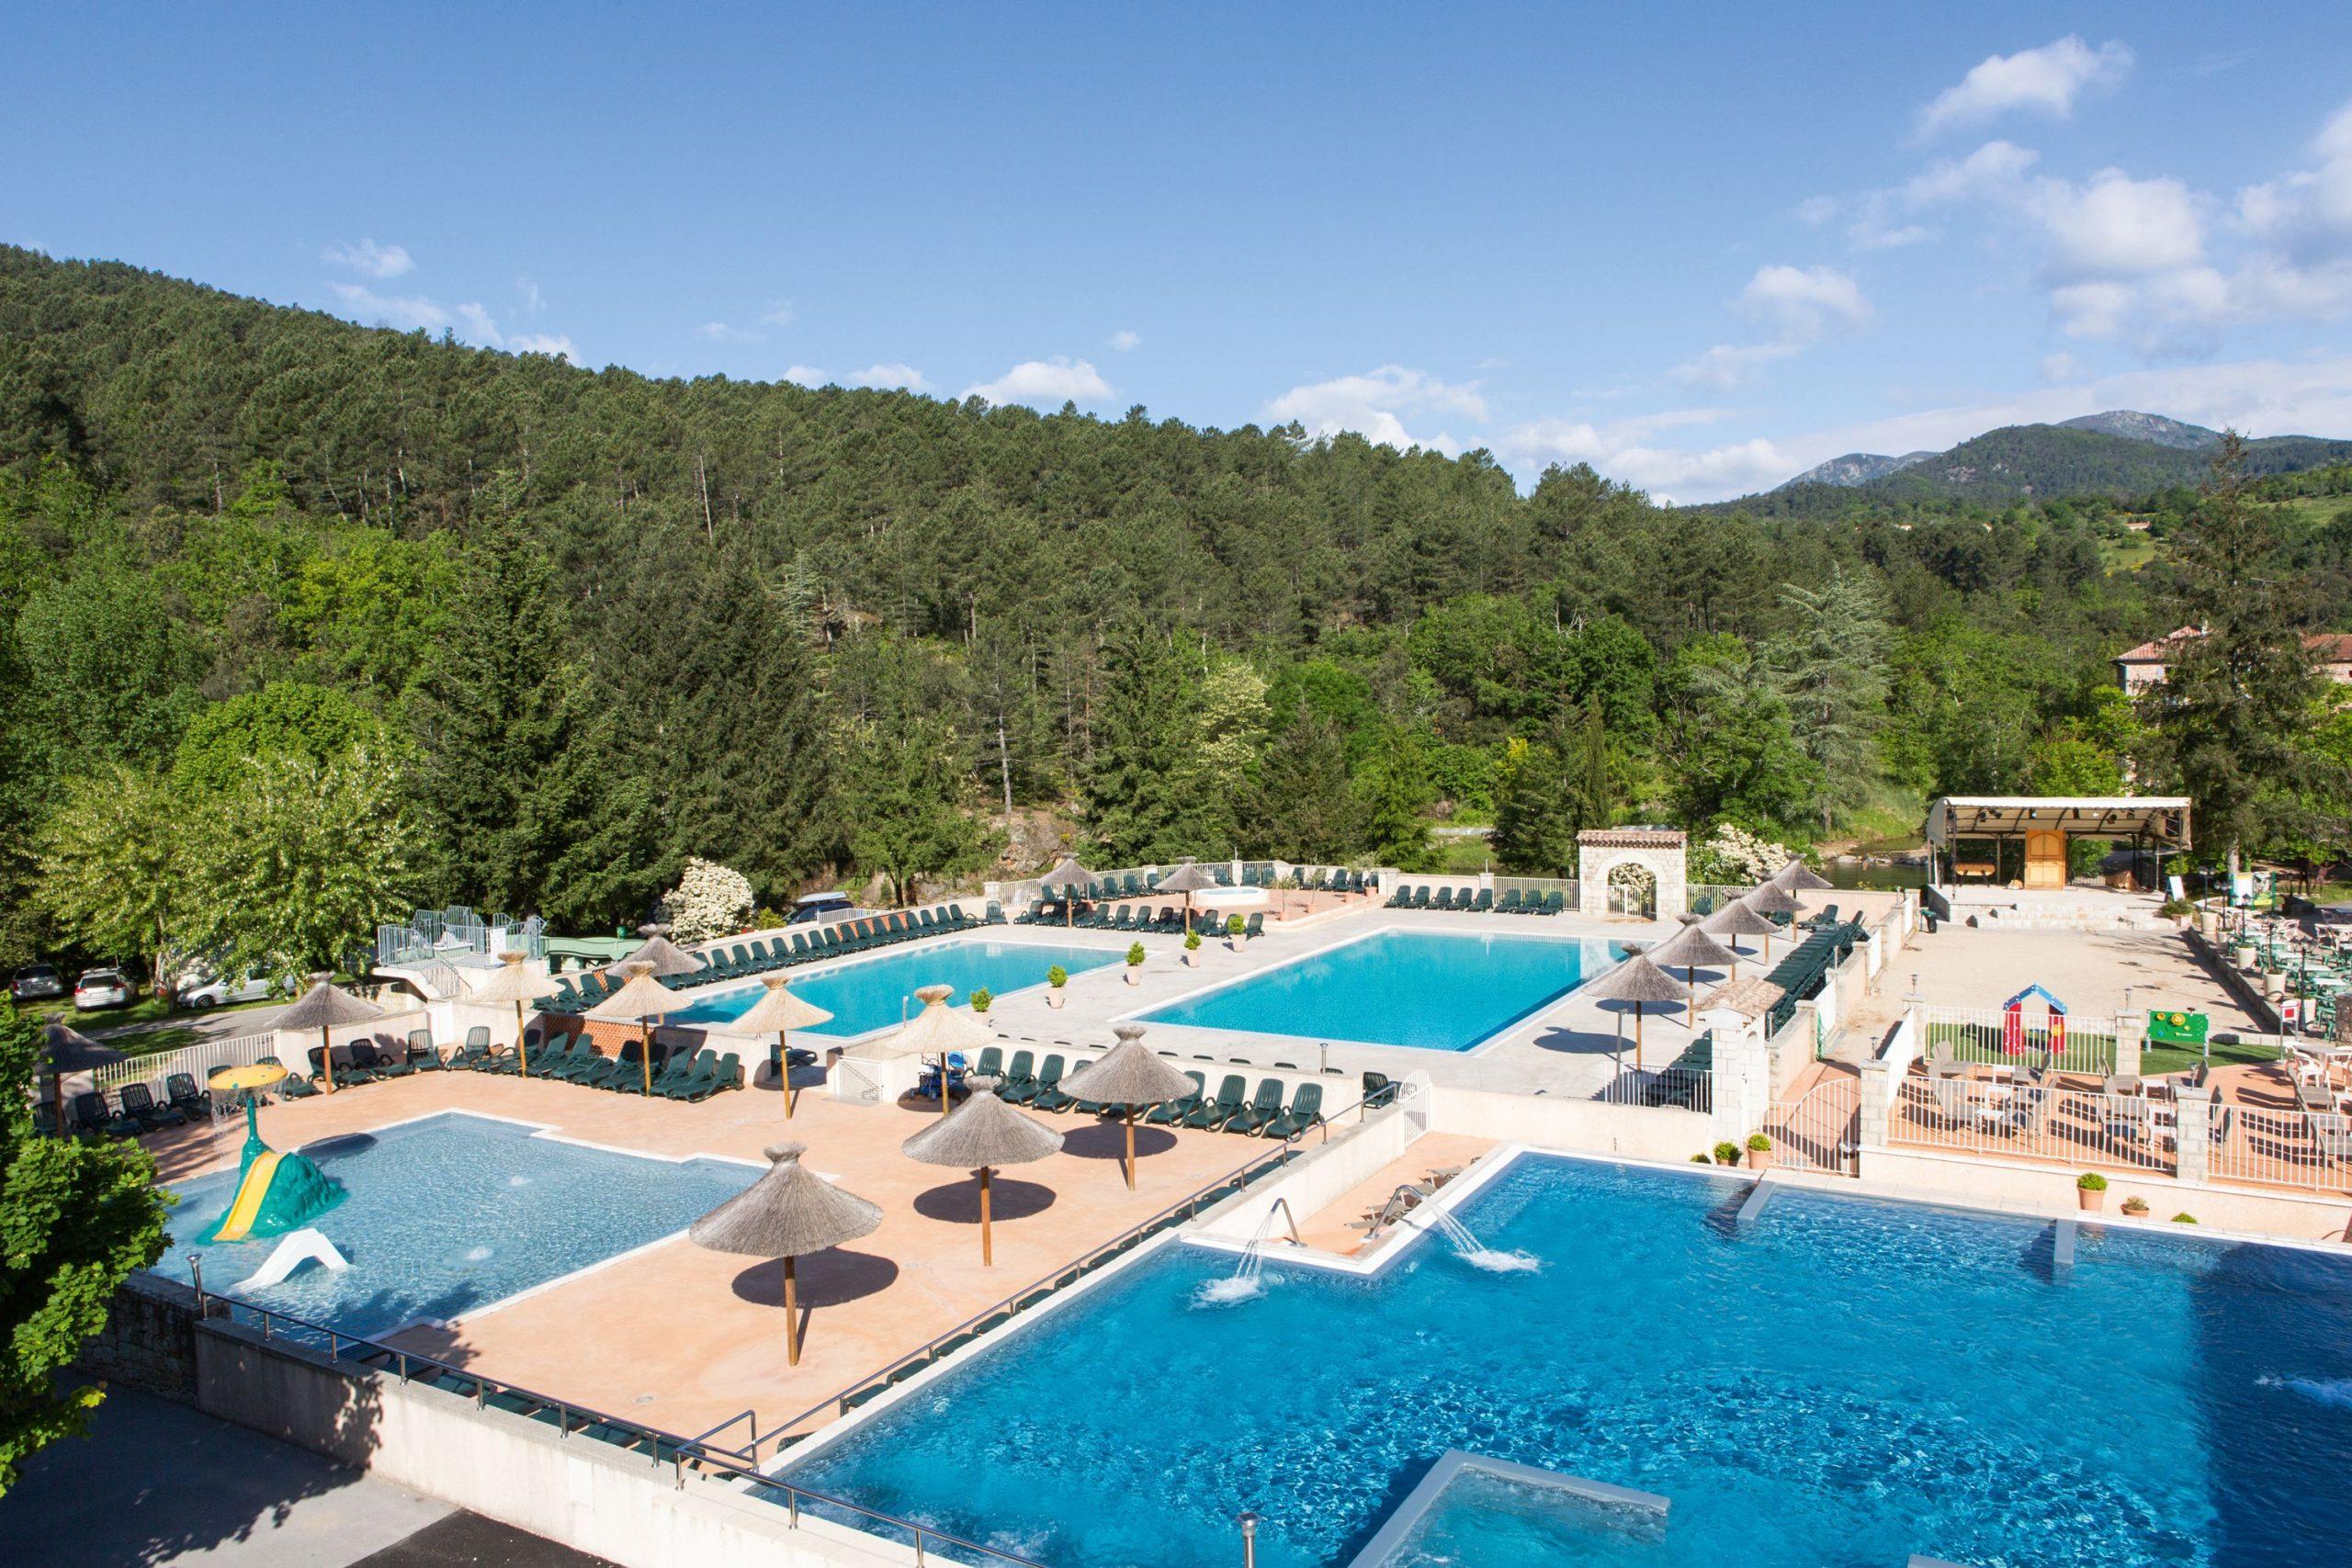 Camping Les Ranchisses | Campagne | Camping Ardèche, Camping ... serapportantà Camping Ardèche Avec Piscine